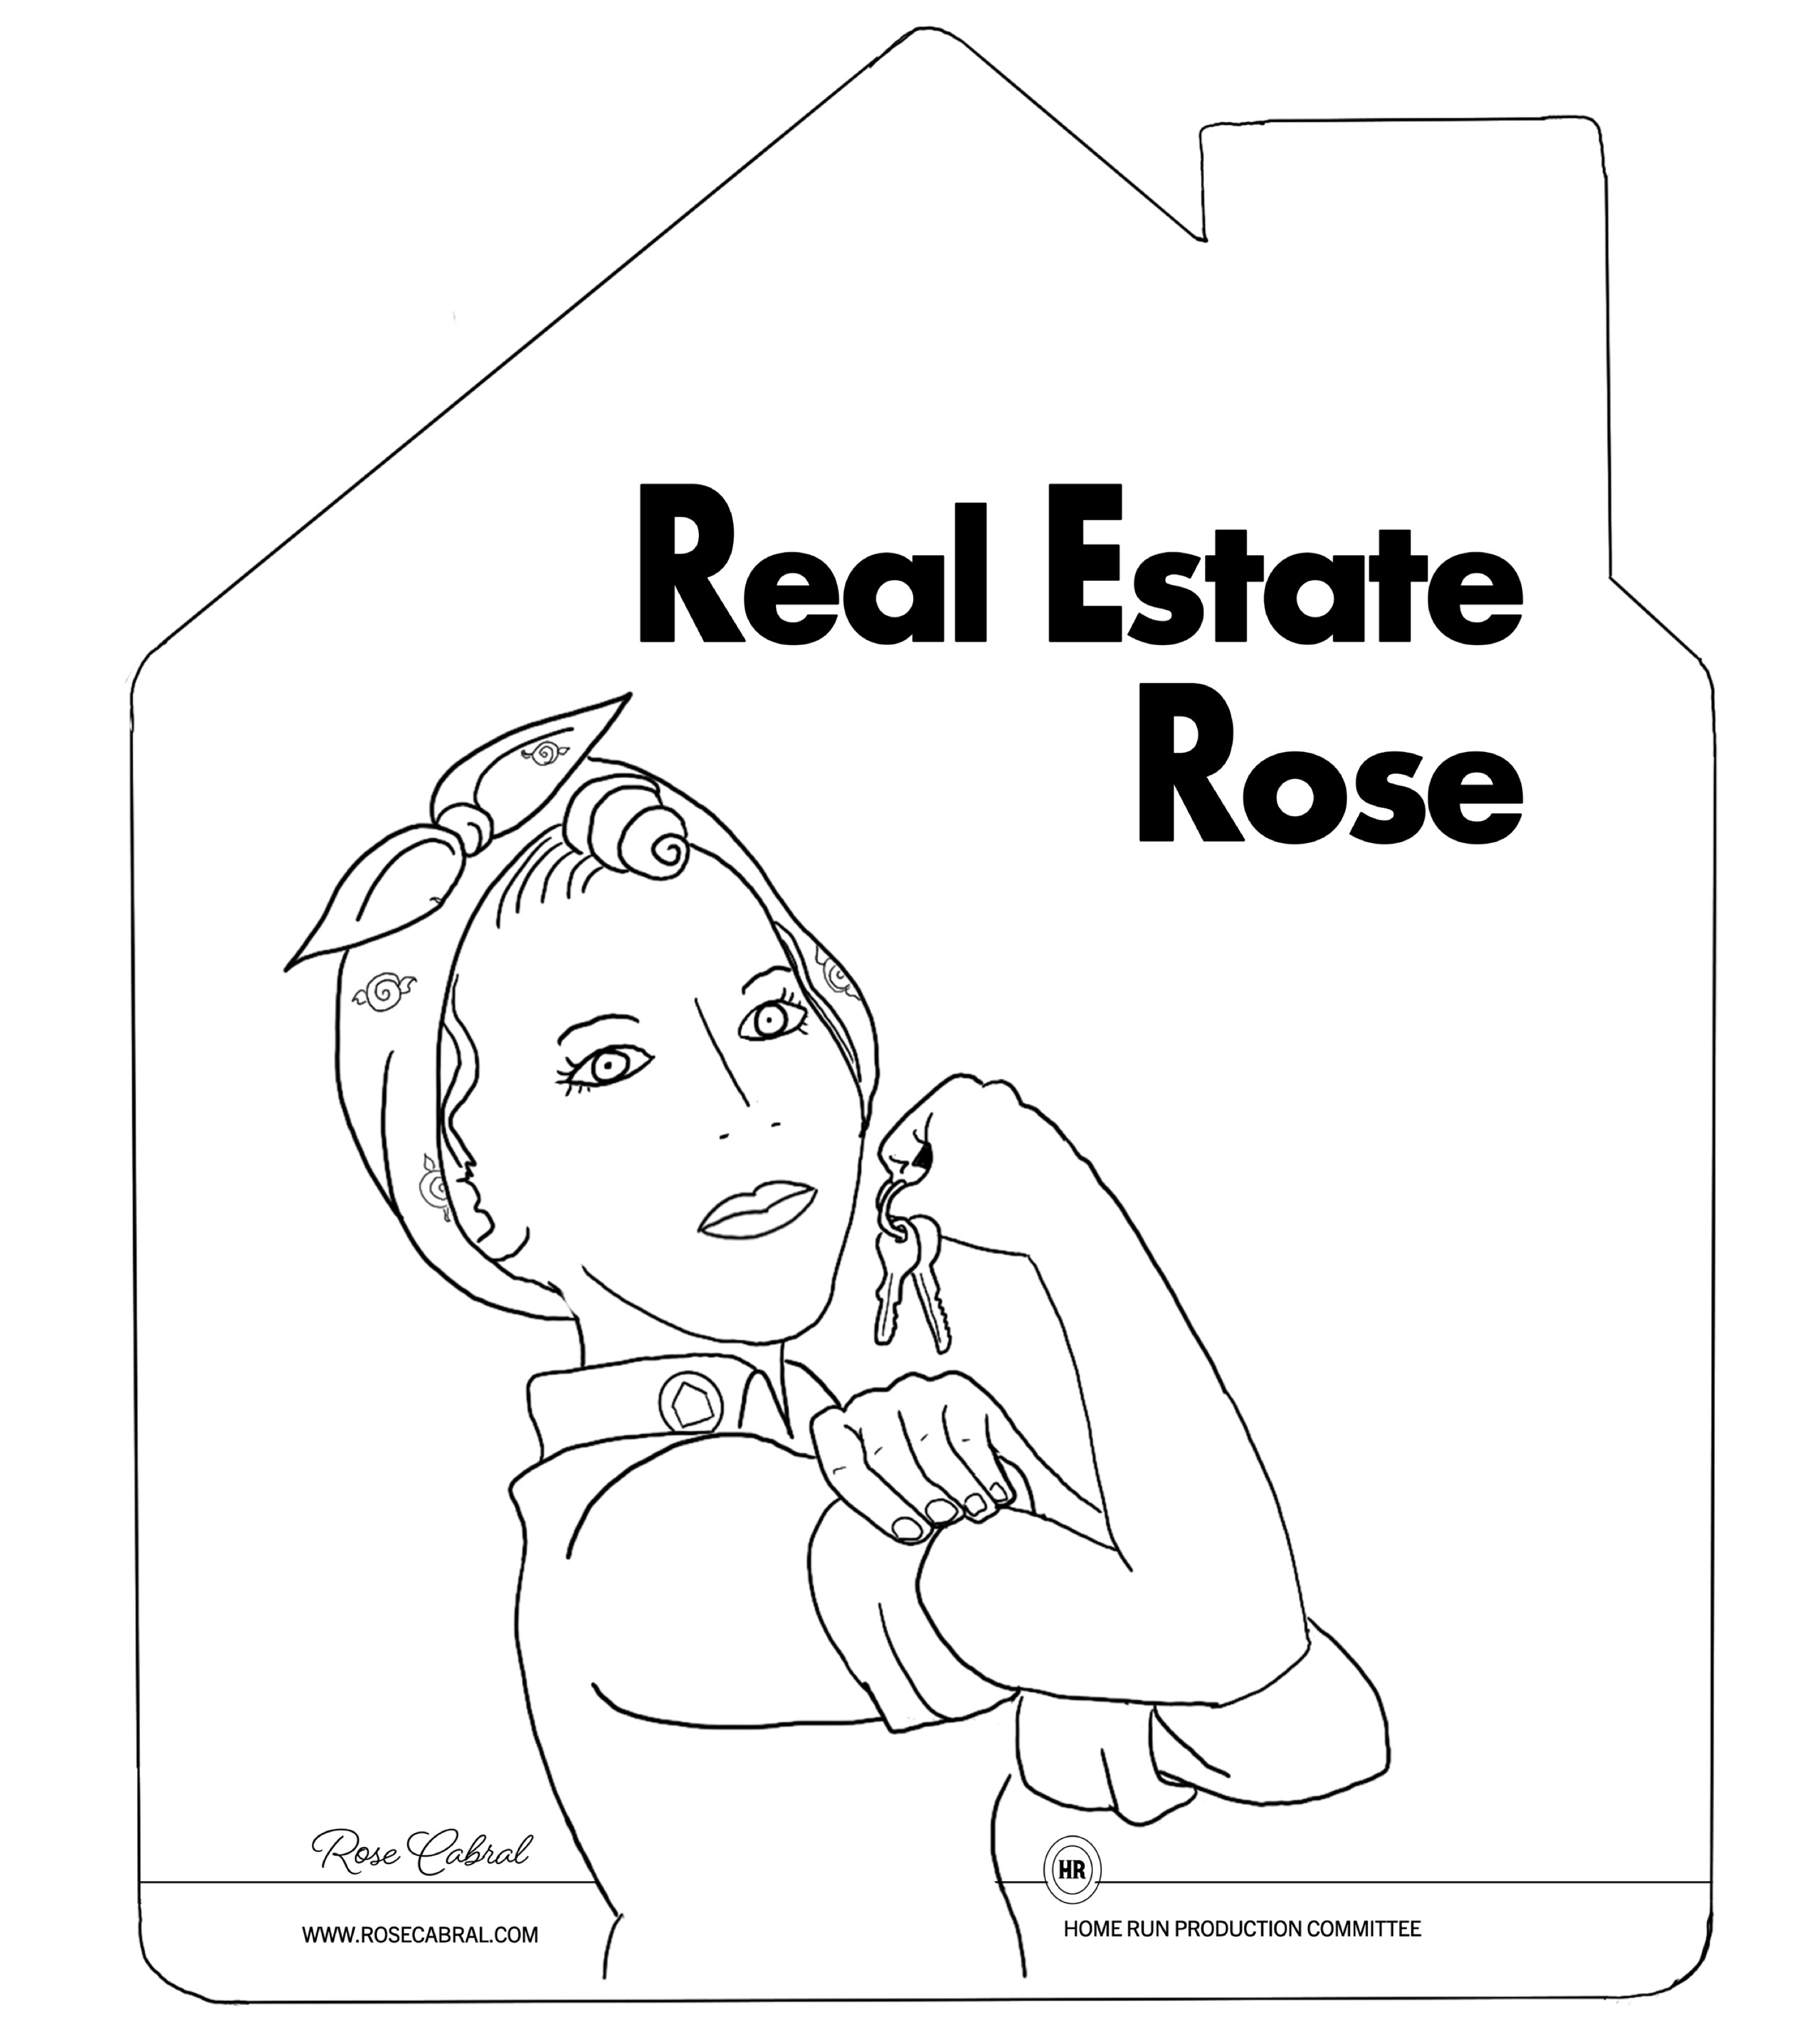 Real Estate Rose black and white illustration